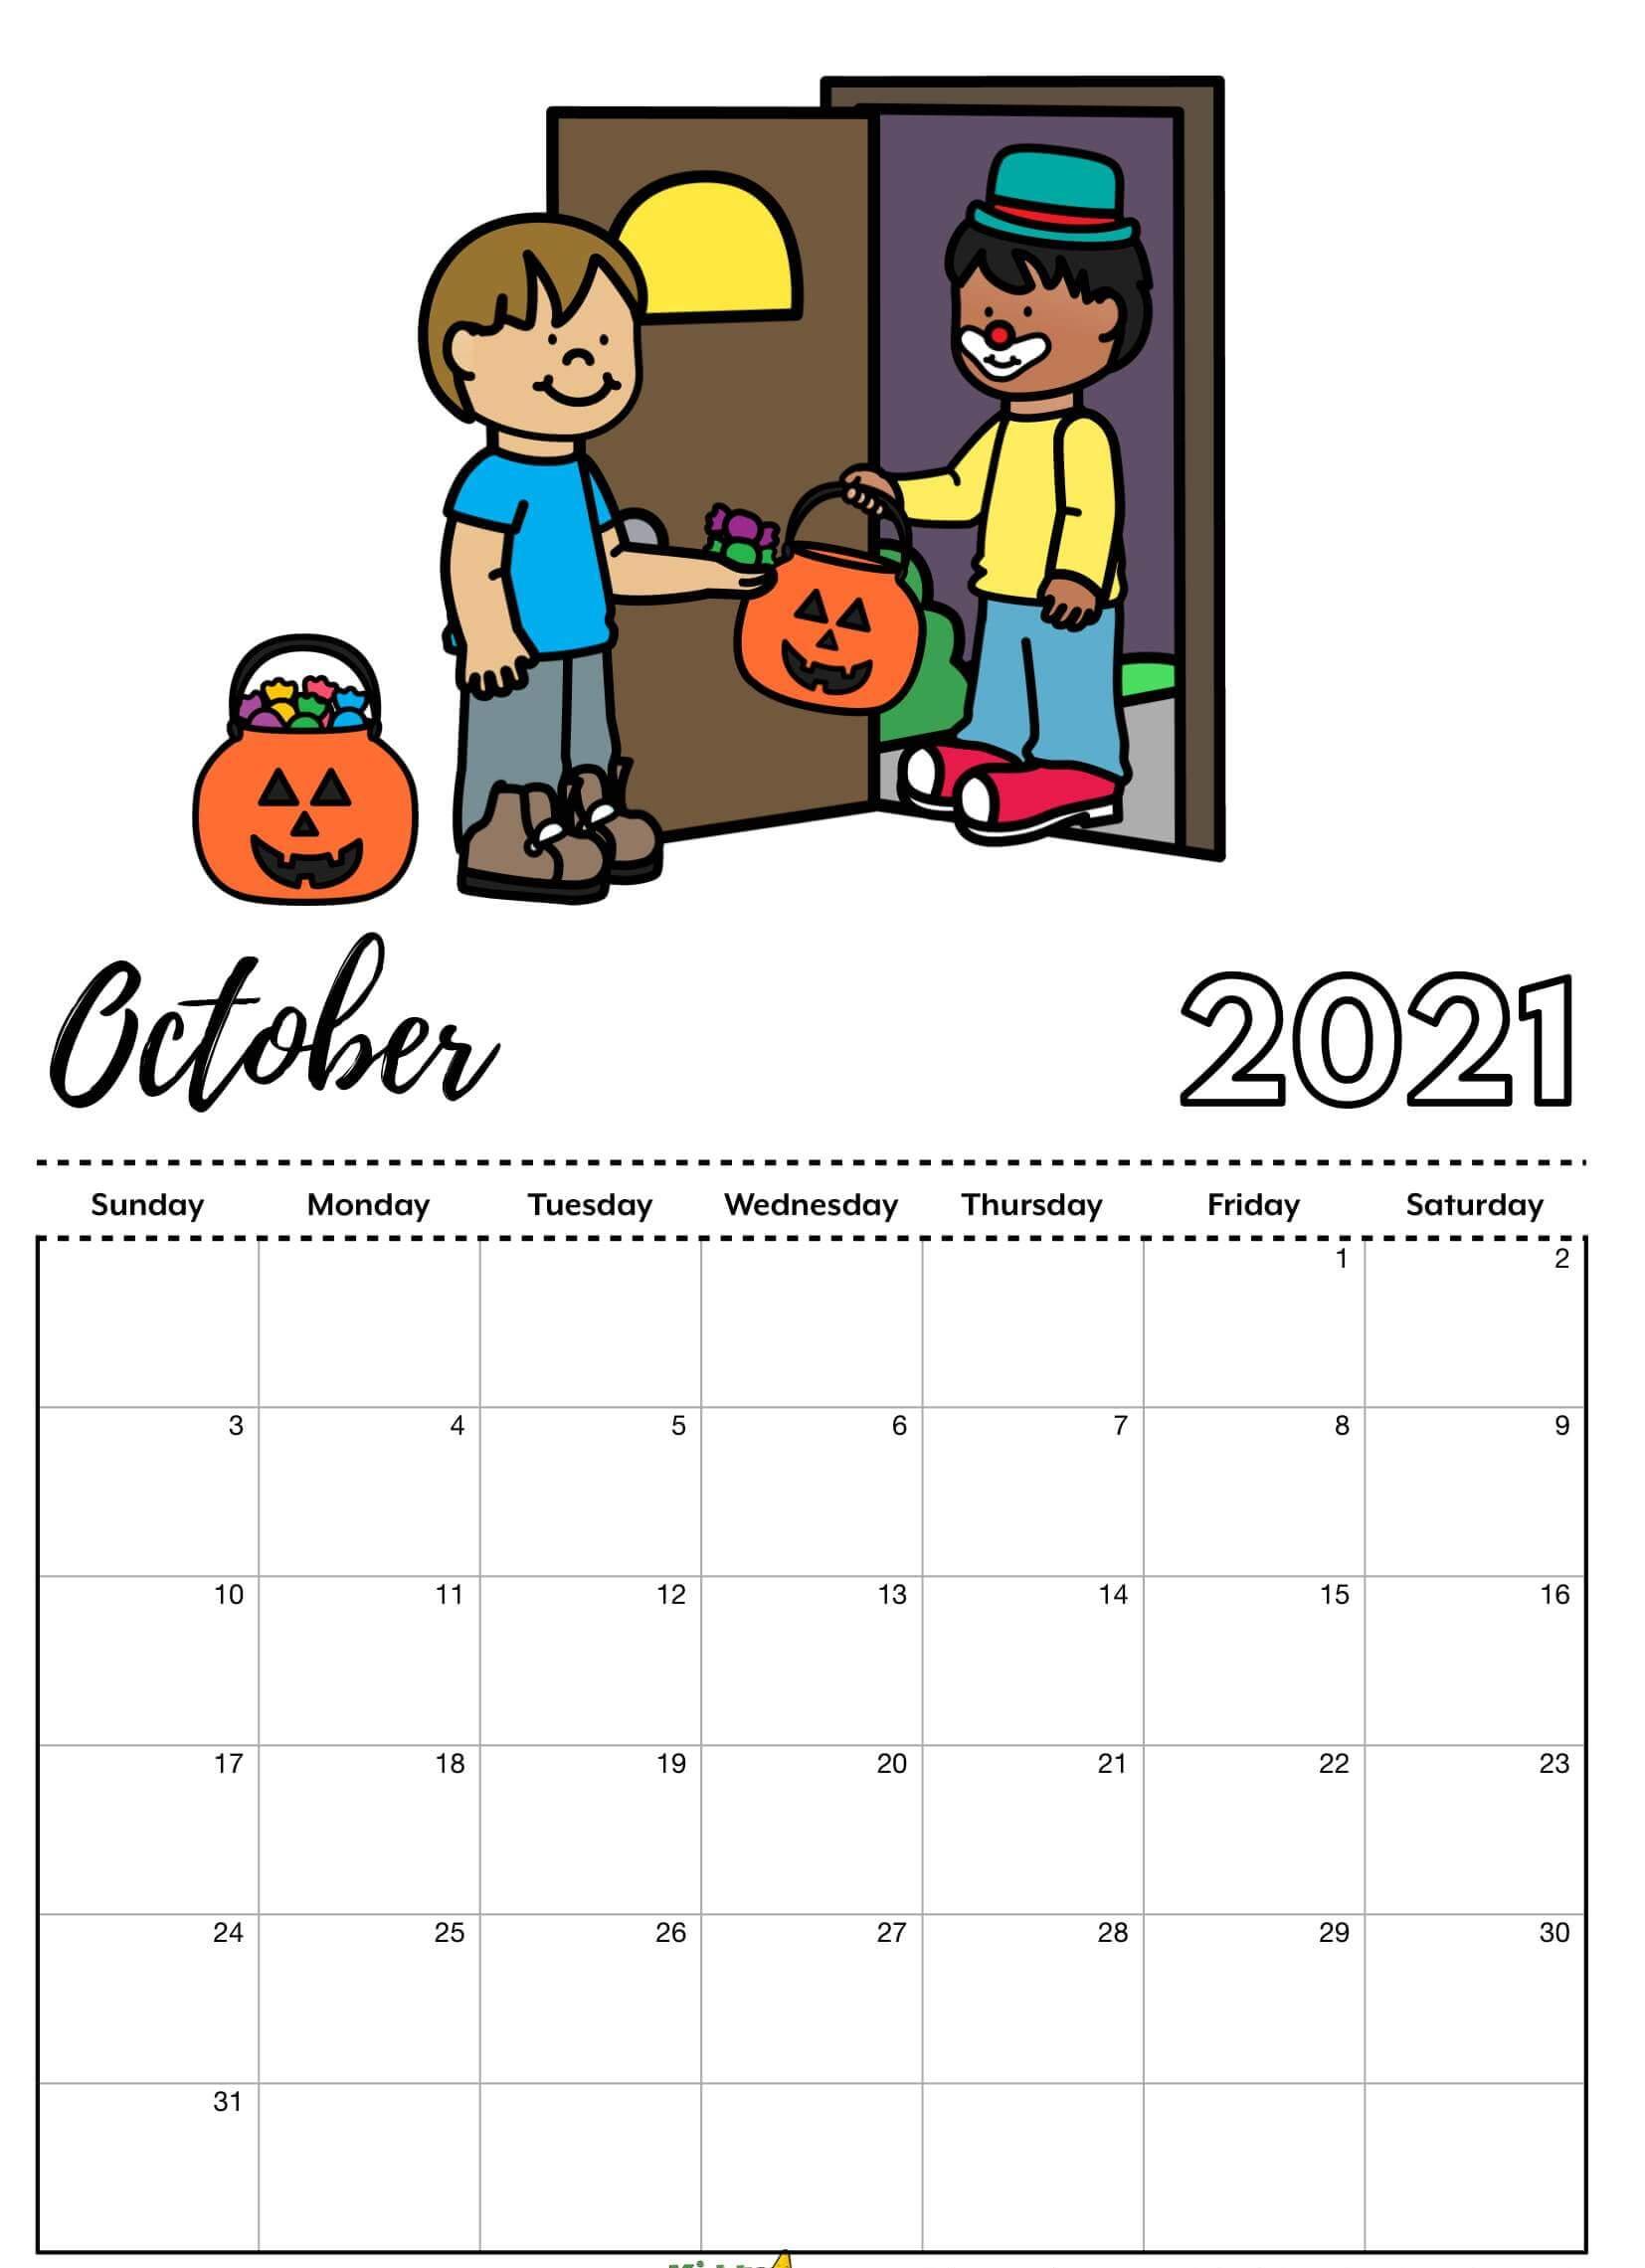 Printable October 2021 Calendar Cute For Kids